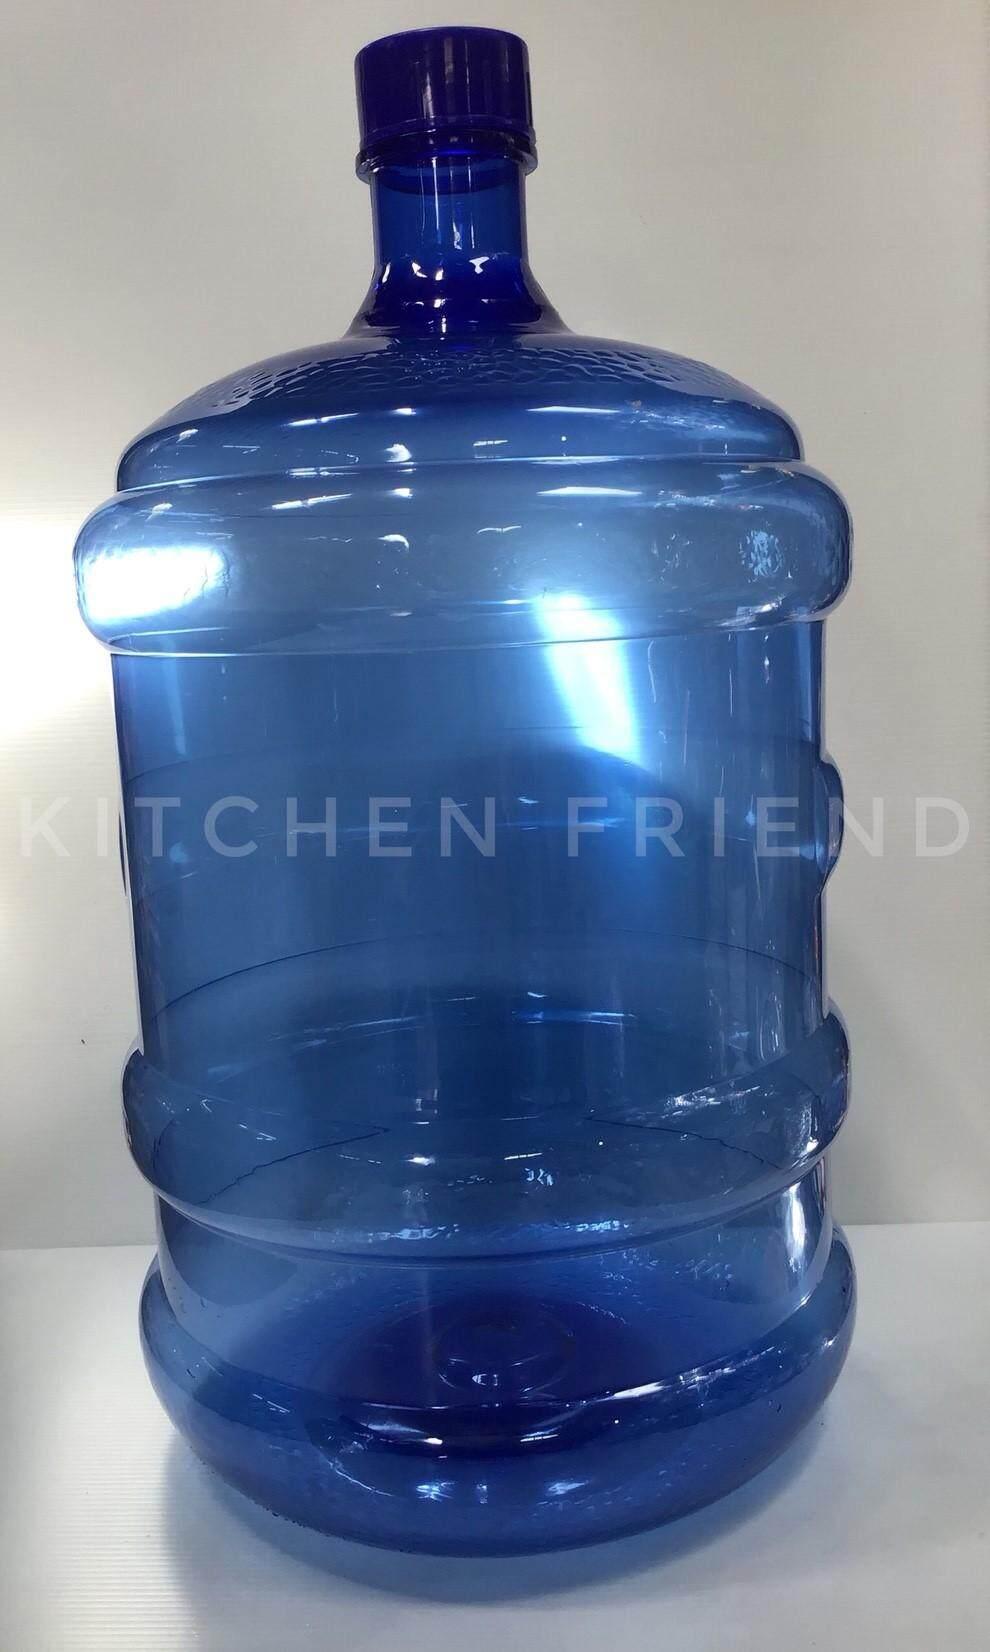 Kitchen Friend ถังใส่น้ำดื่มความจุ 18.9 ลิตร Food Grade ใช้กับที่ปั๊มน้ำได้ .